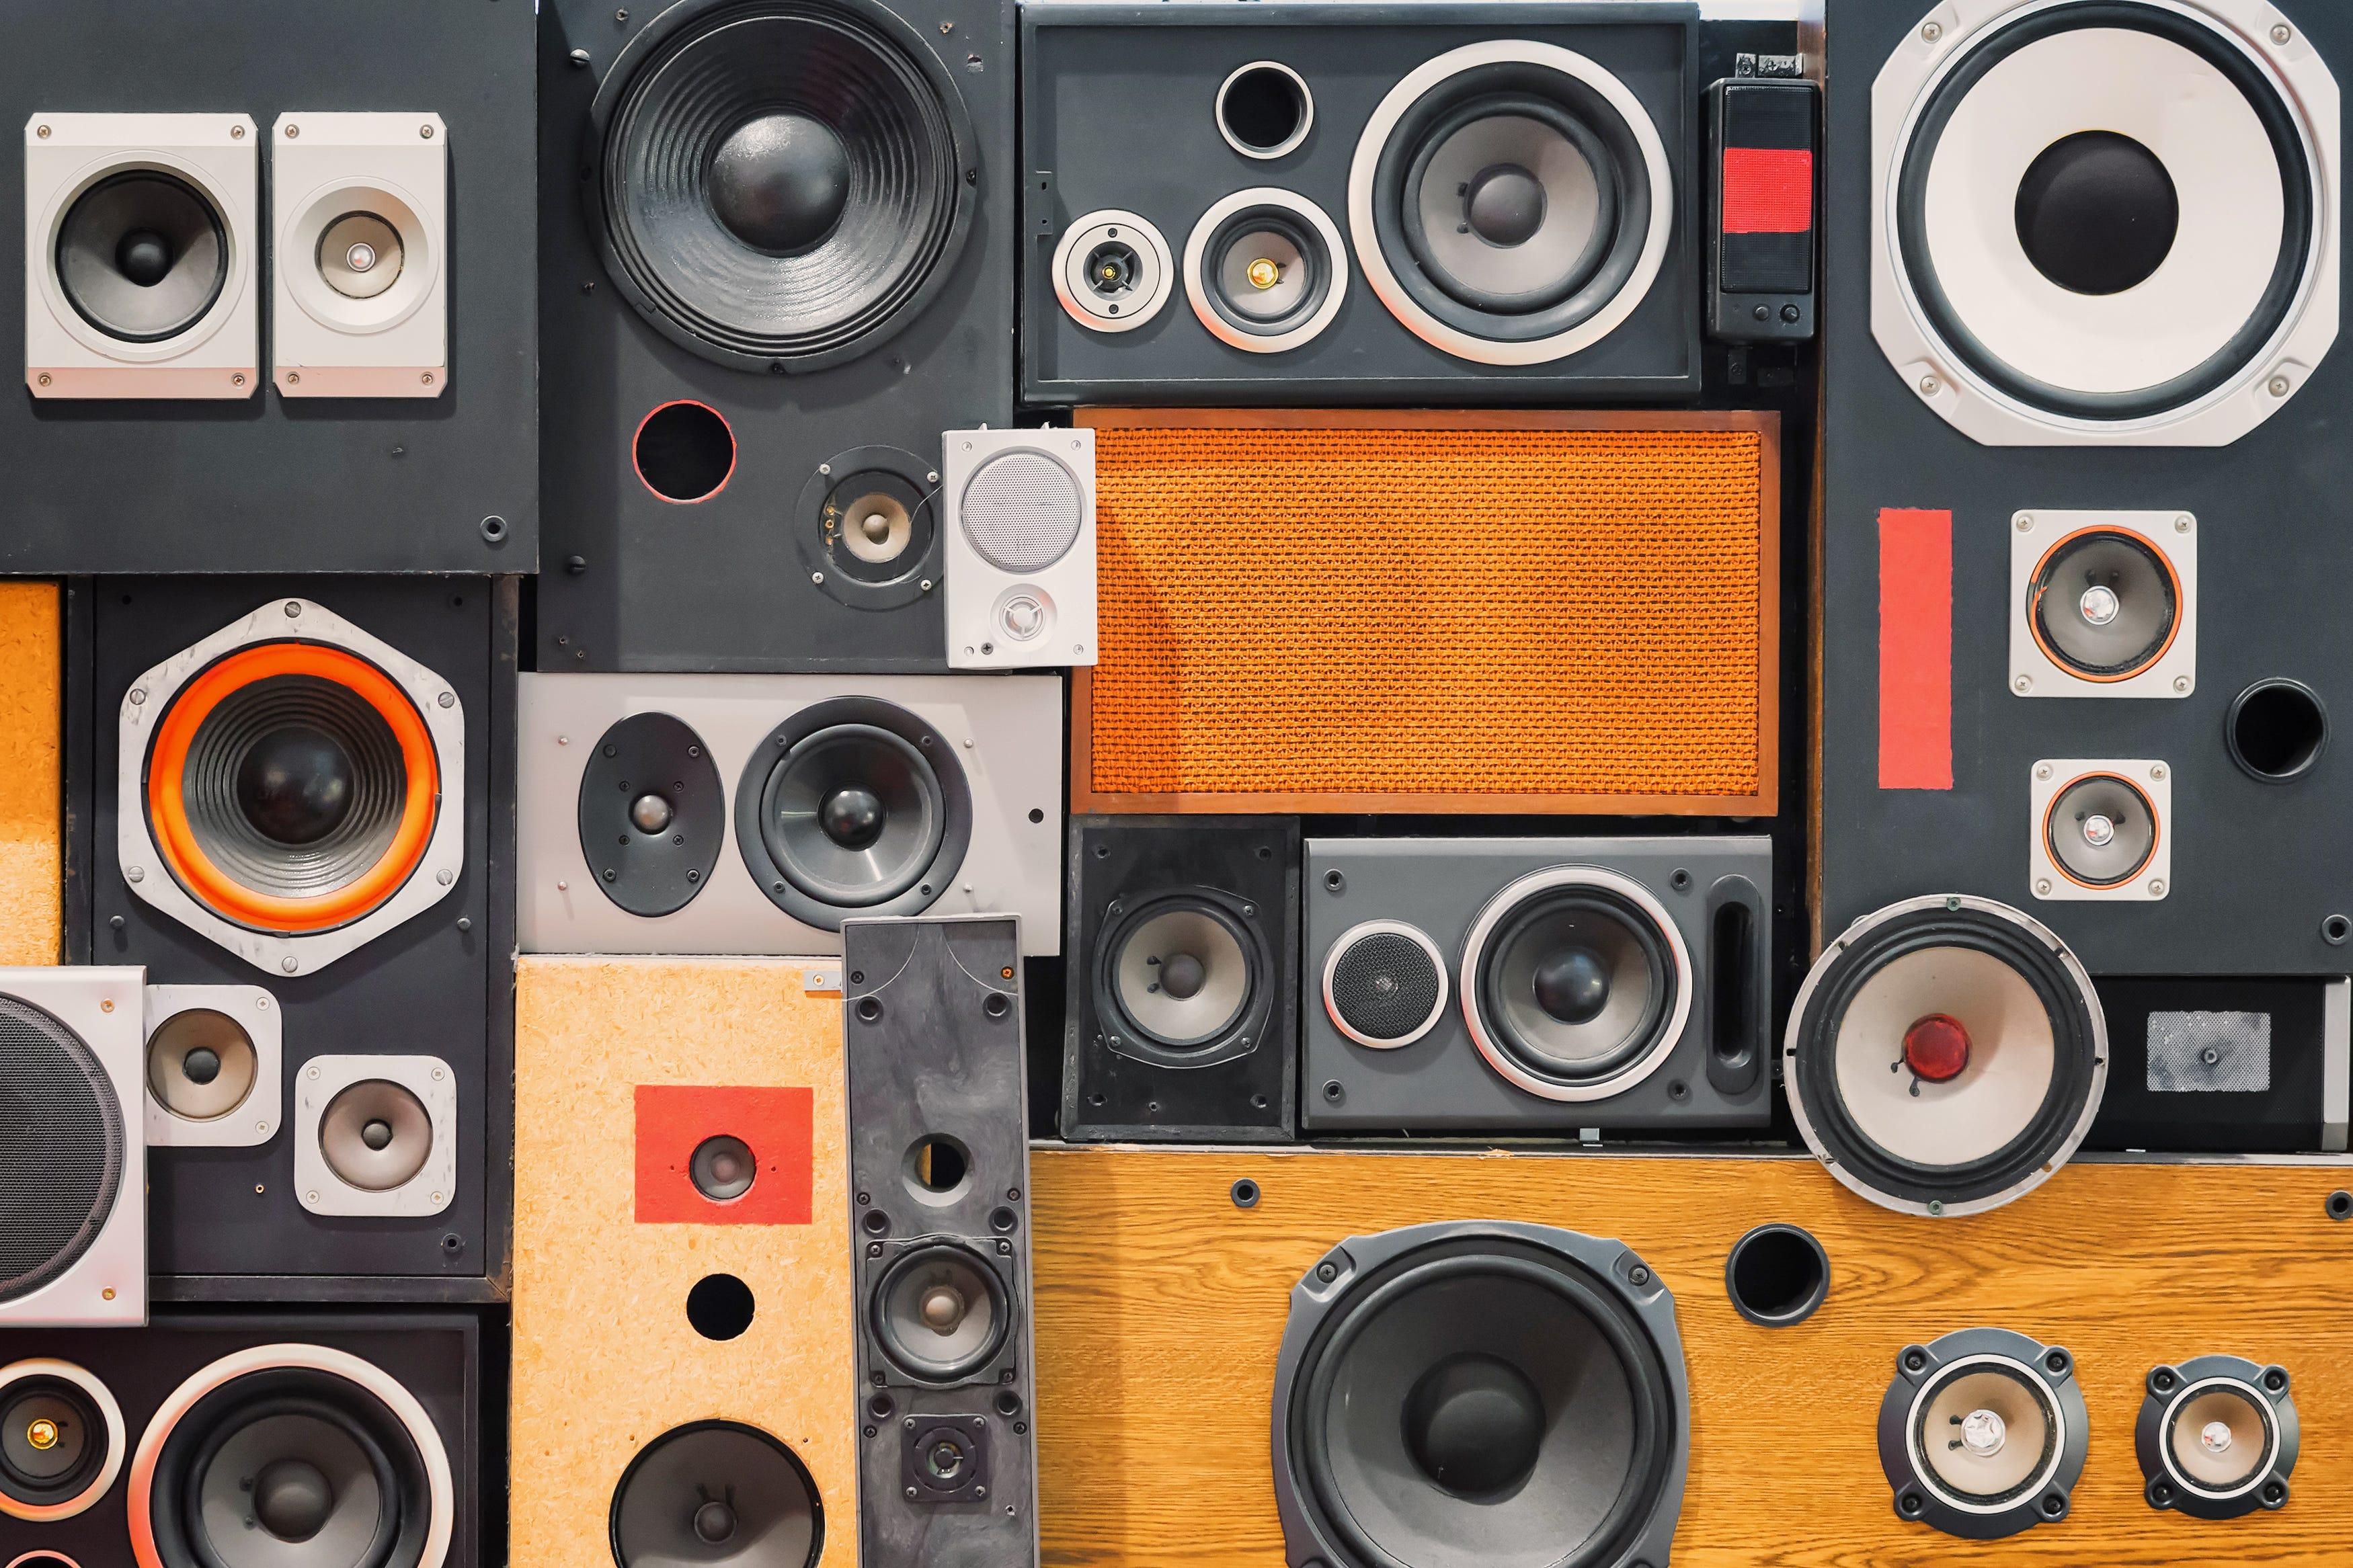 Know Your Speakers: Hi-fi Speakers vs Studio Monitors vs PA Speakers